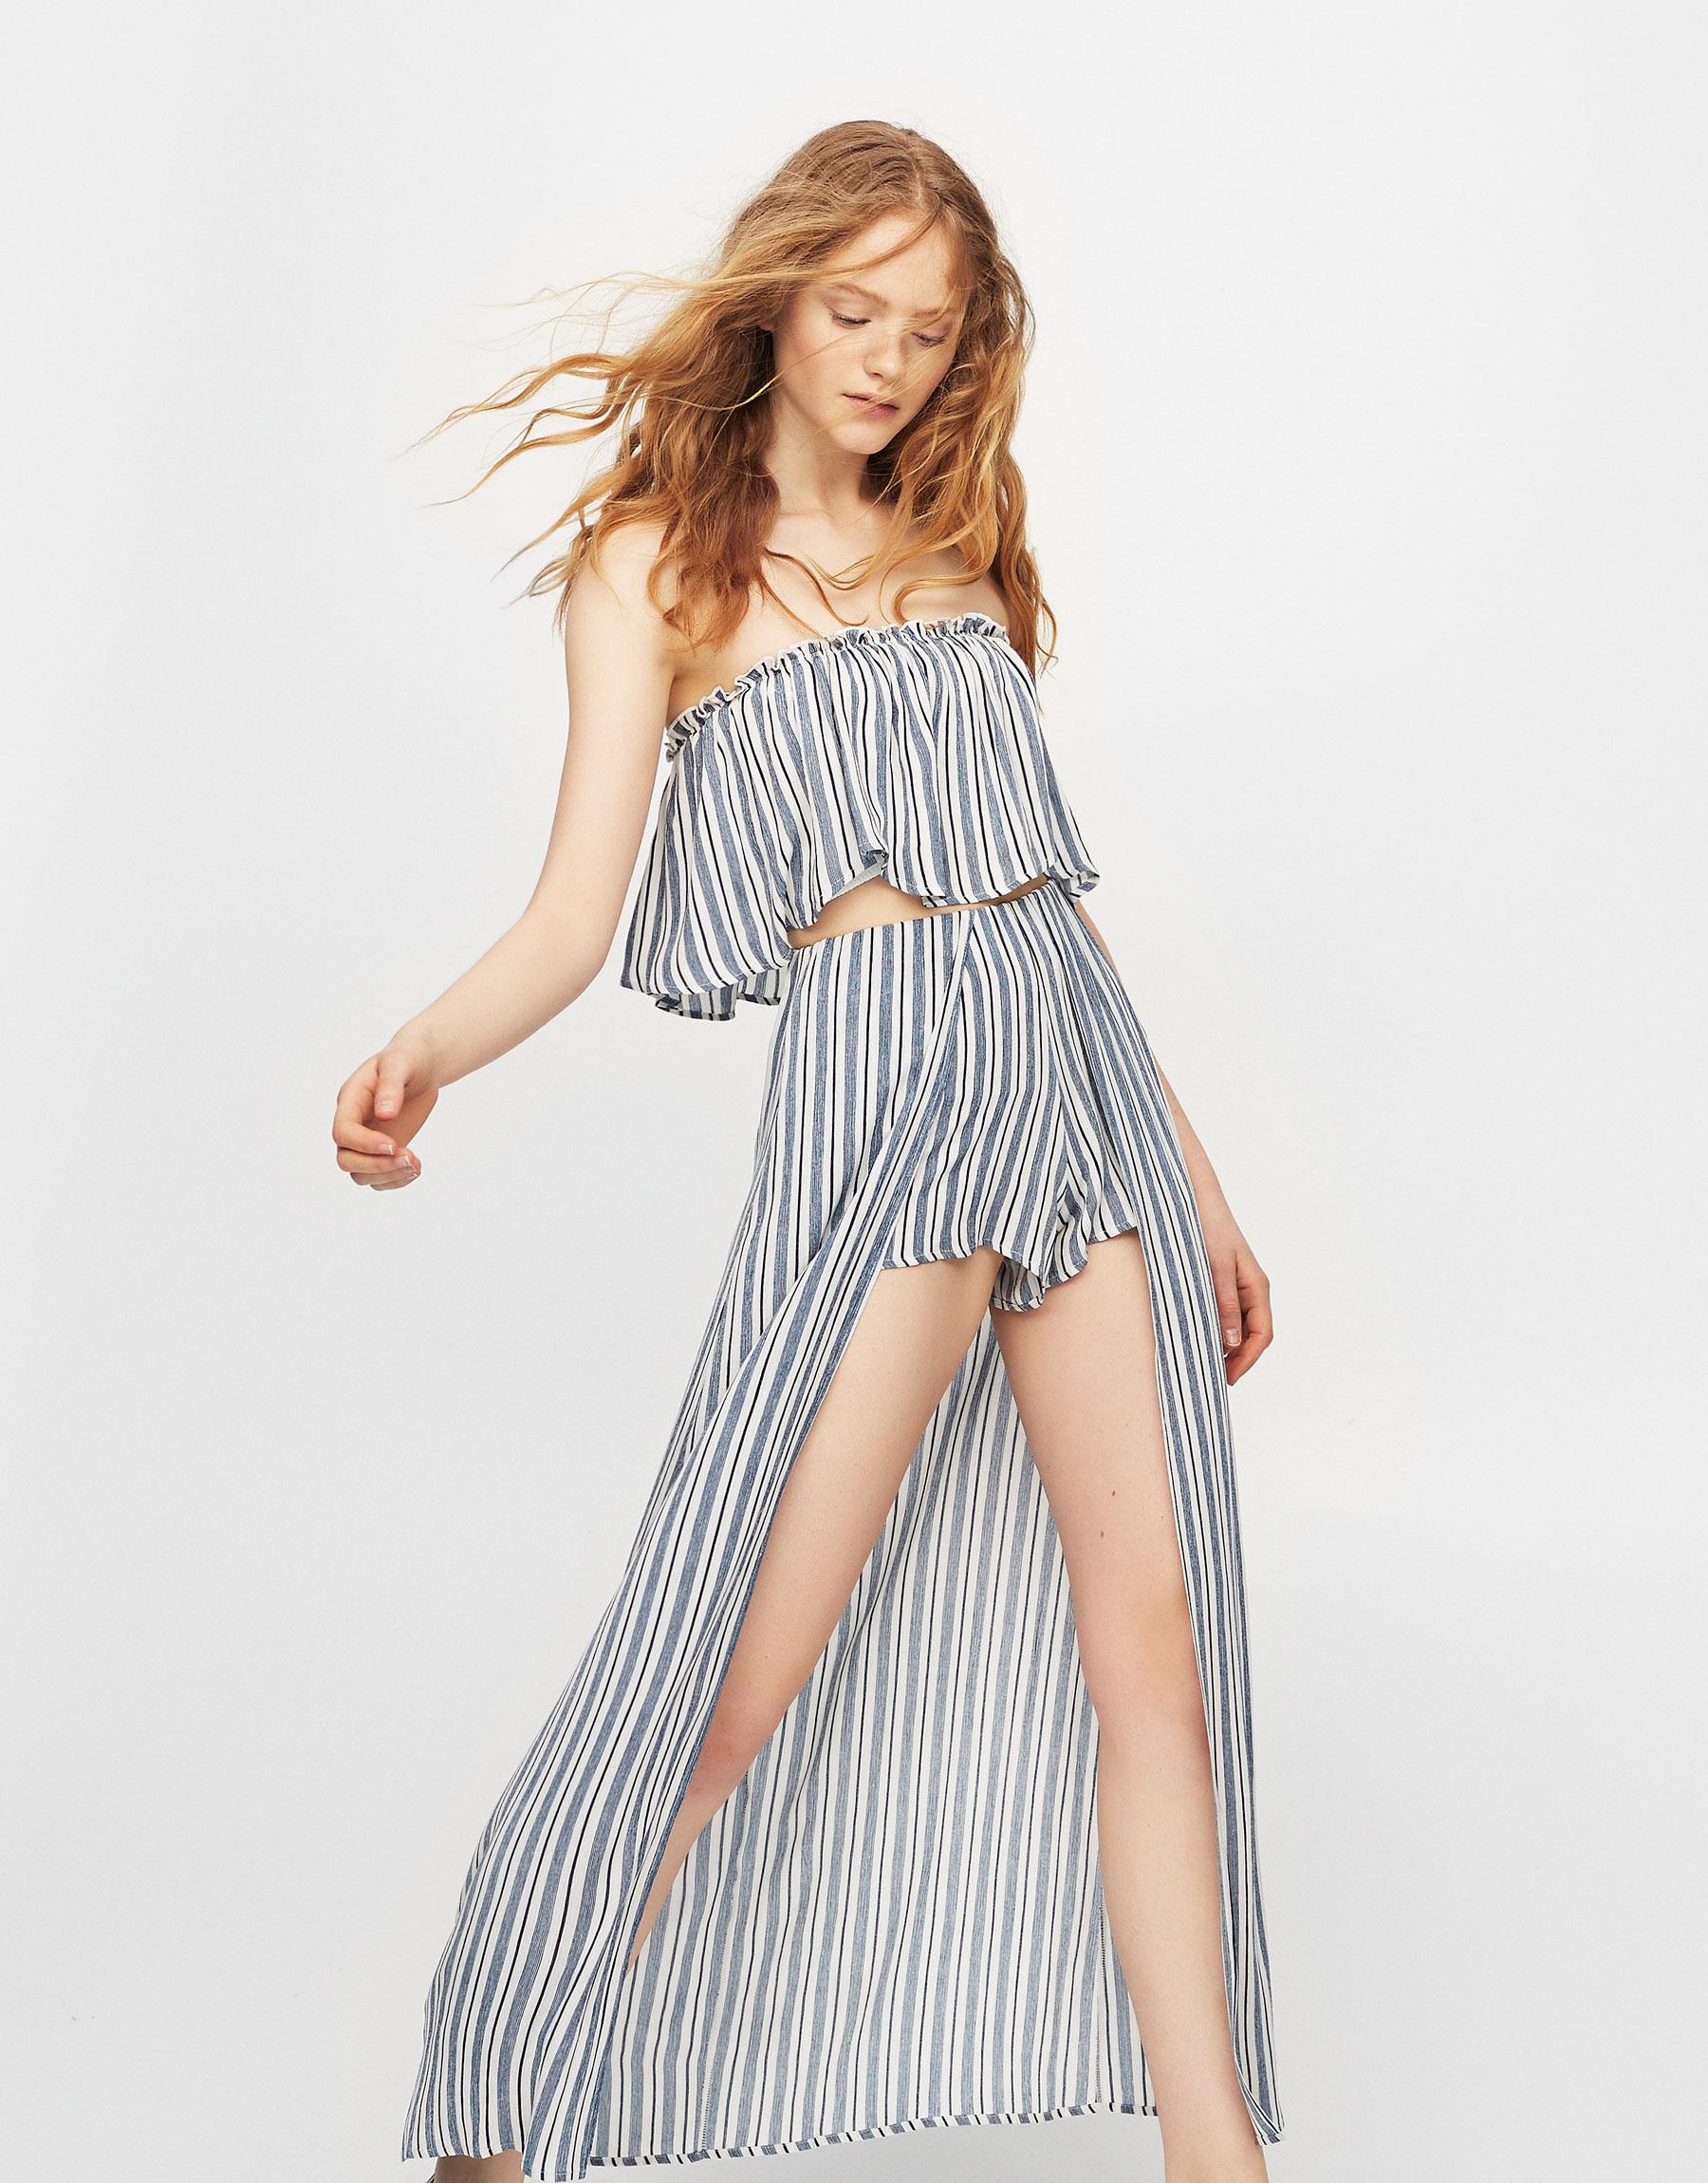 Striped skorts